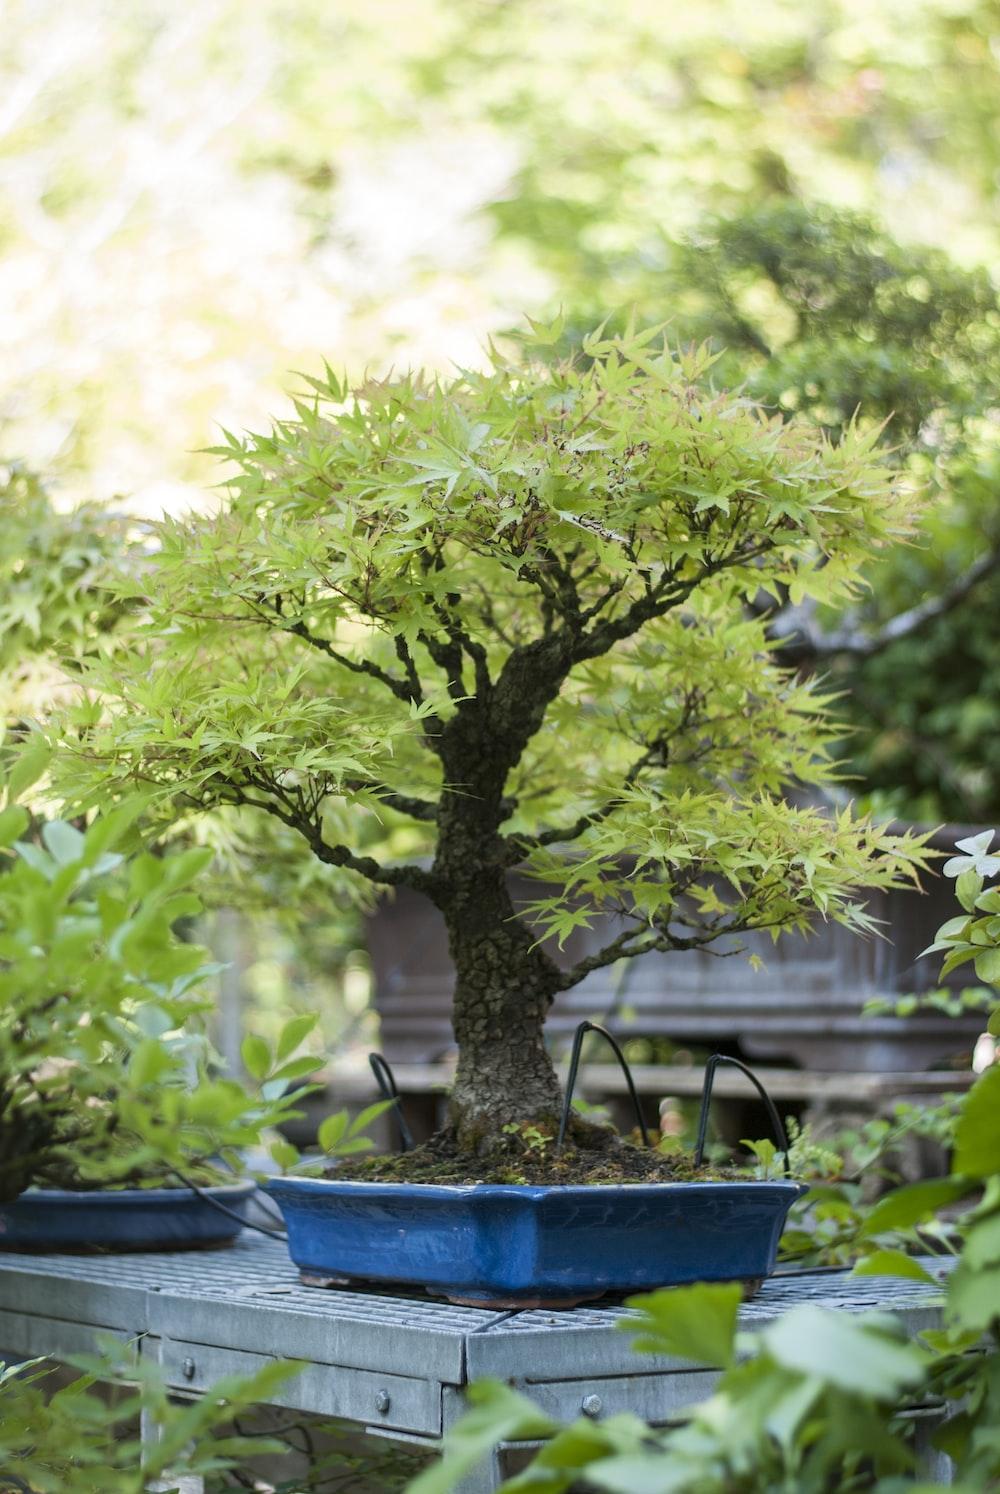 bonsai plant on table in garden